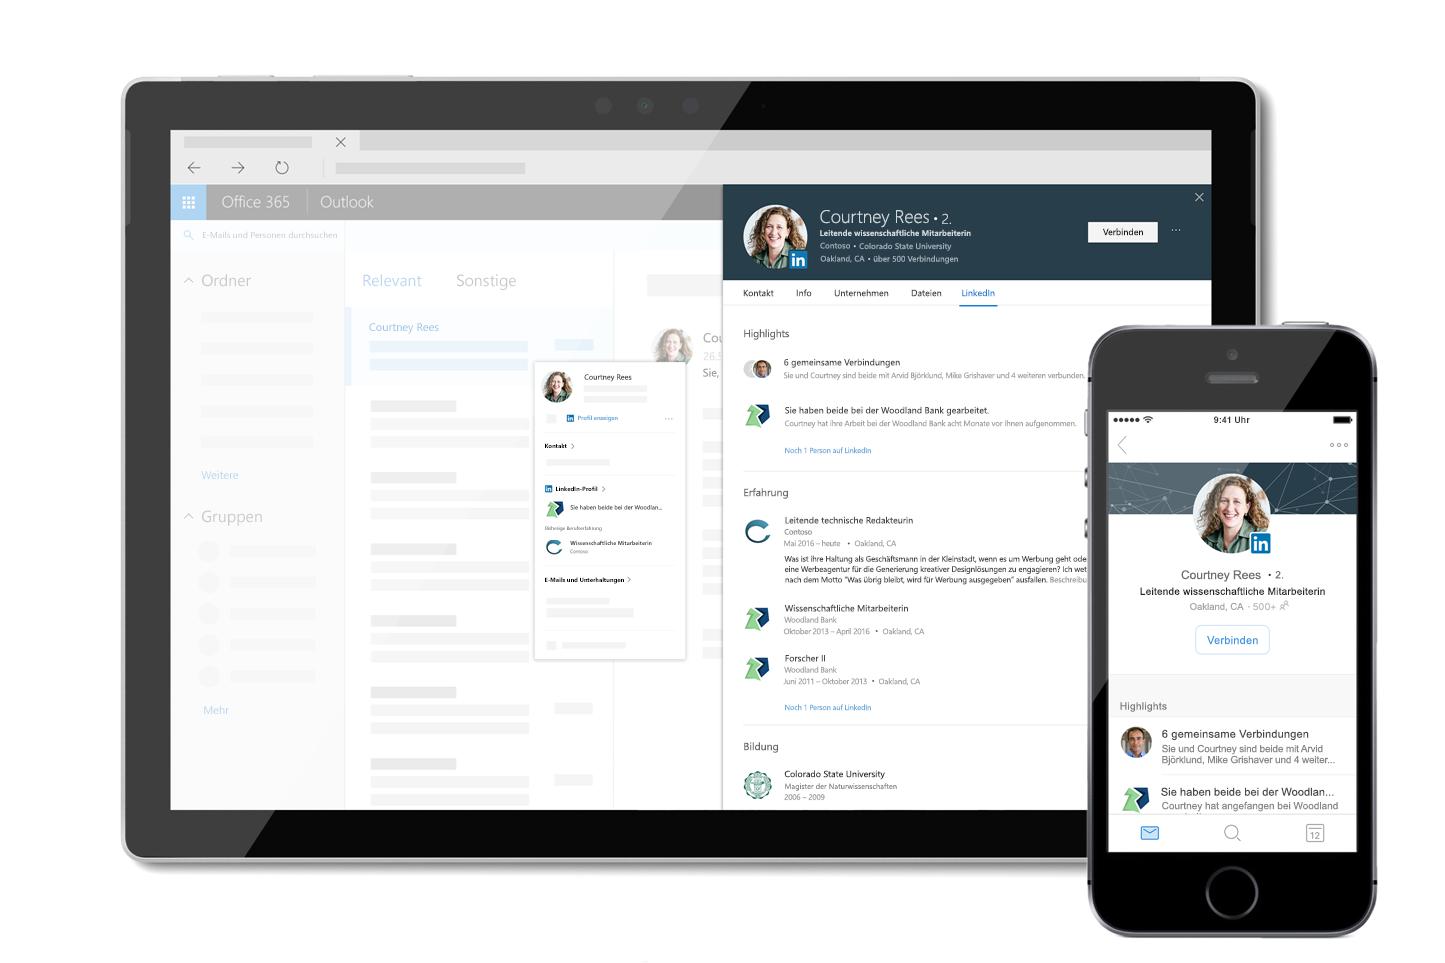 LinkedIn in Ihren Microsoft-apps